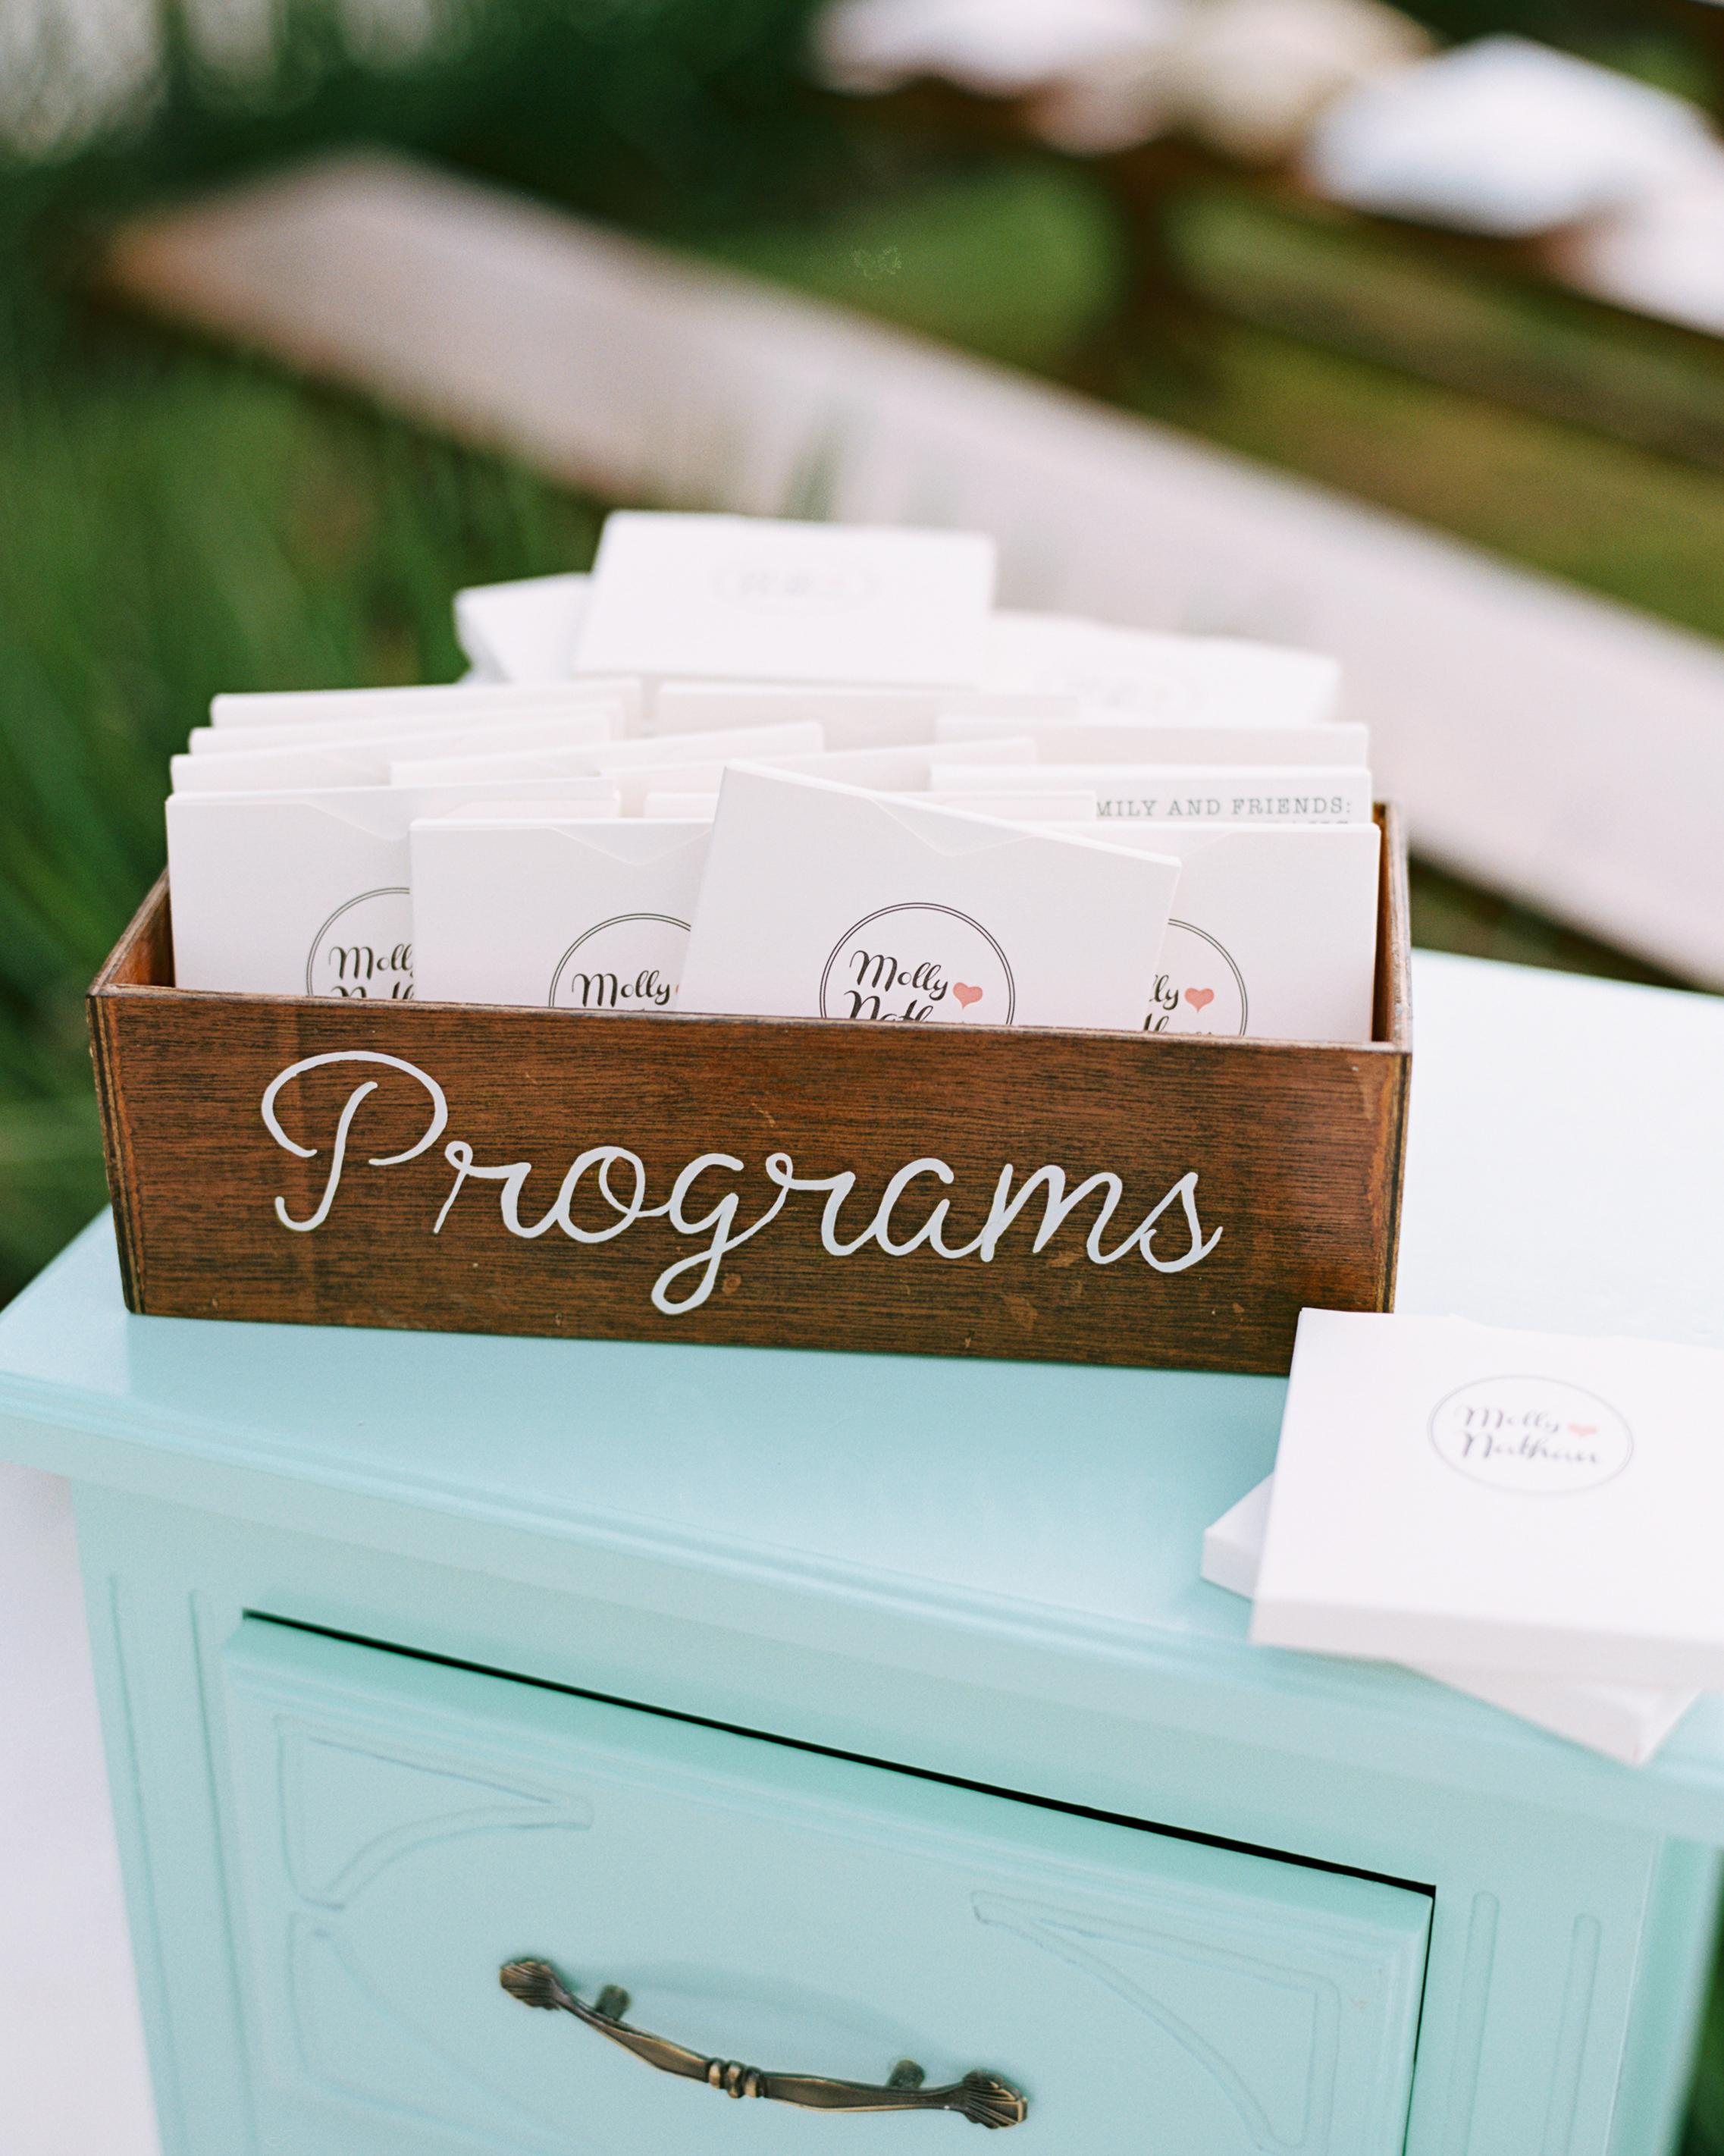 molly-nate-wedding-programs-048-s111479-0814.jpg